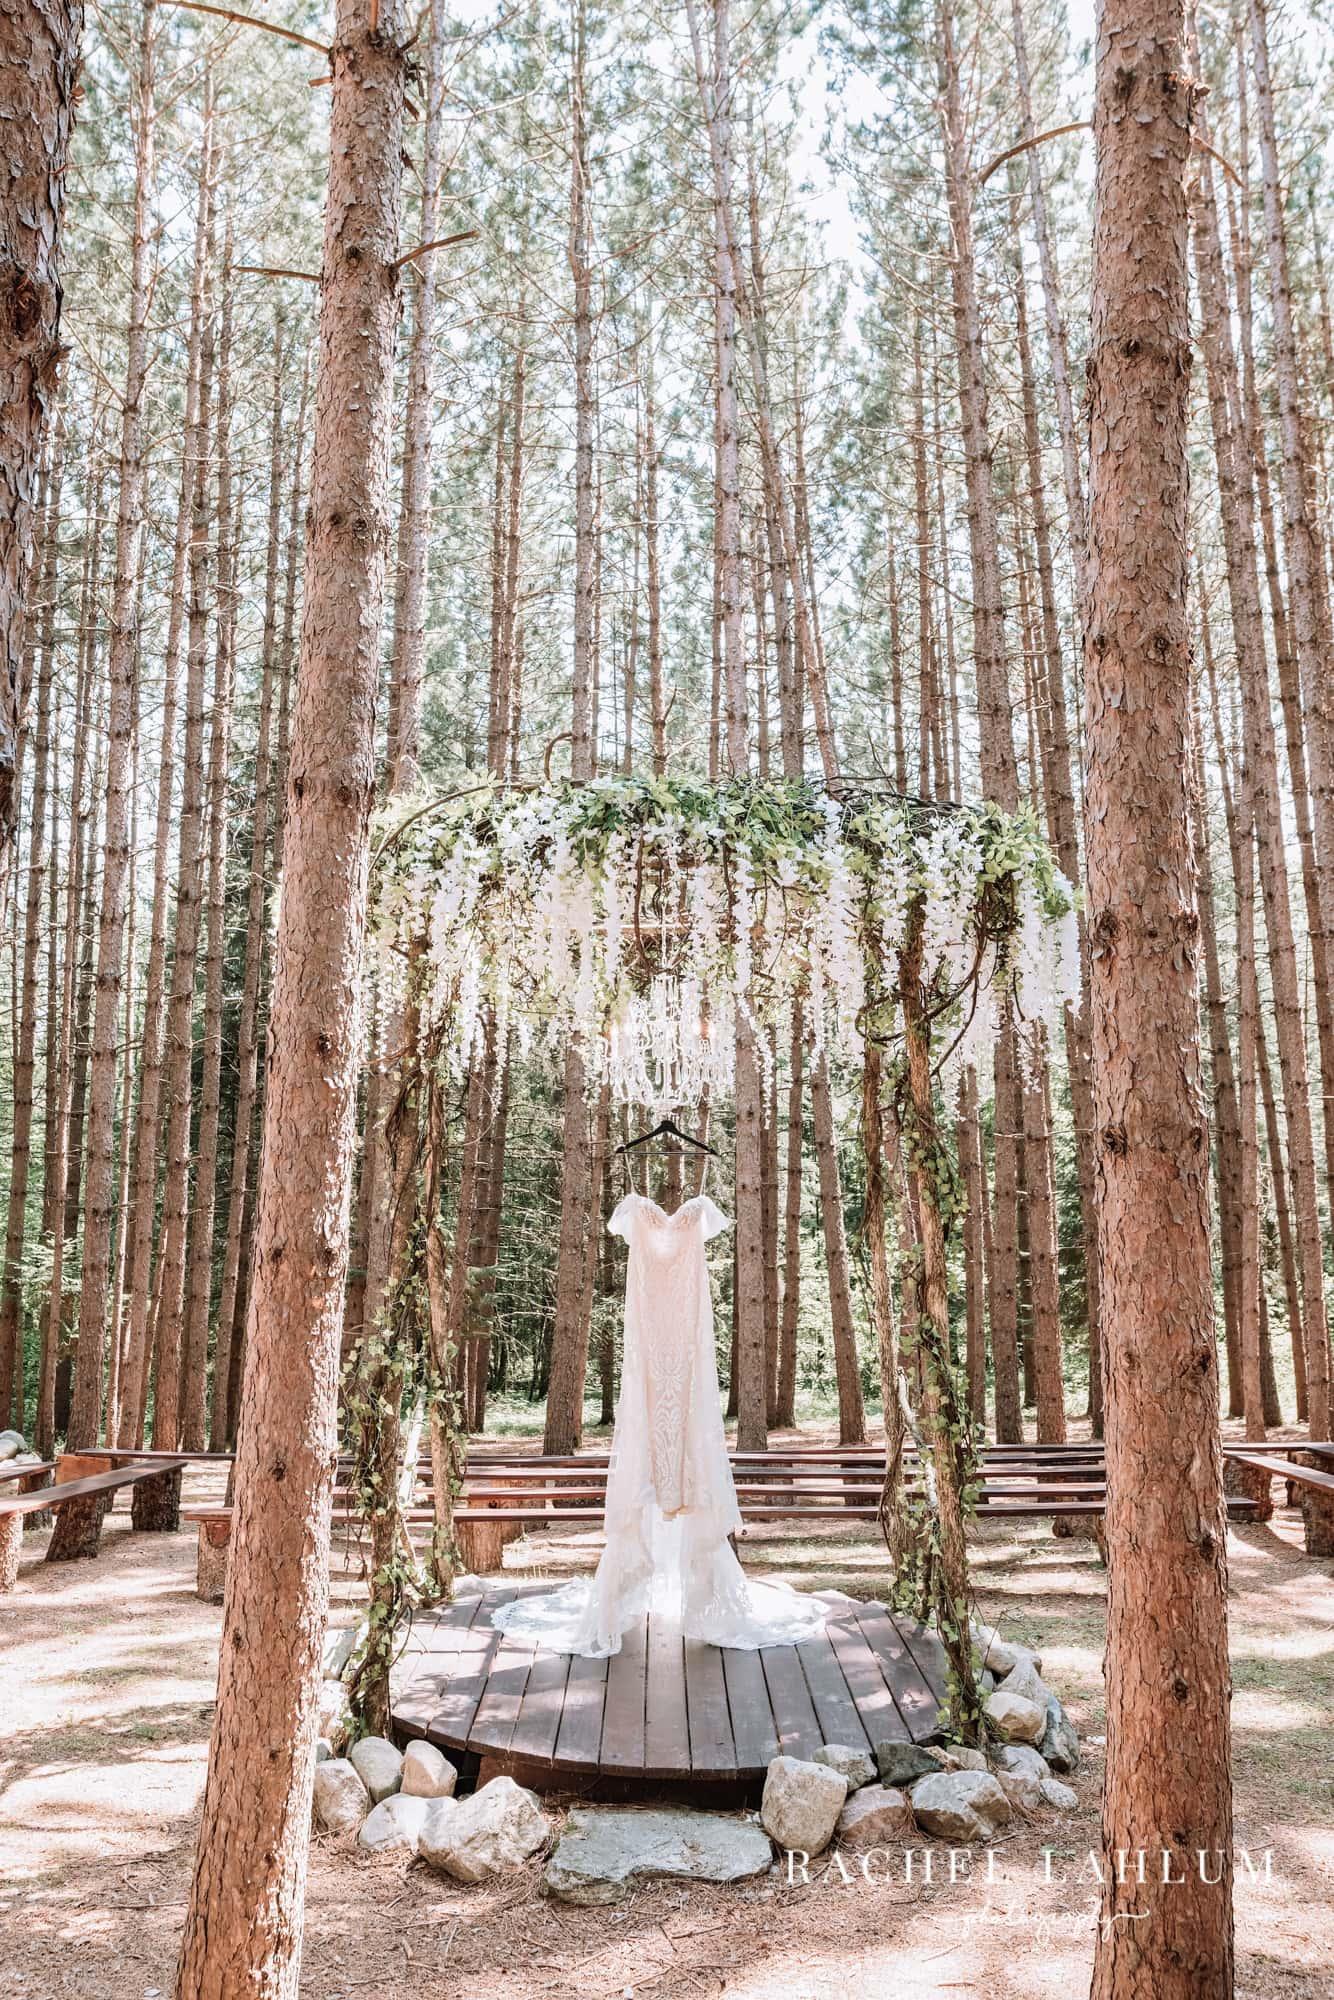 Wedding dress hangs from the ceremony gazebo among Norway pines at Wilderness Wedding Barn in Bigfork, Minnesota.